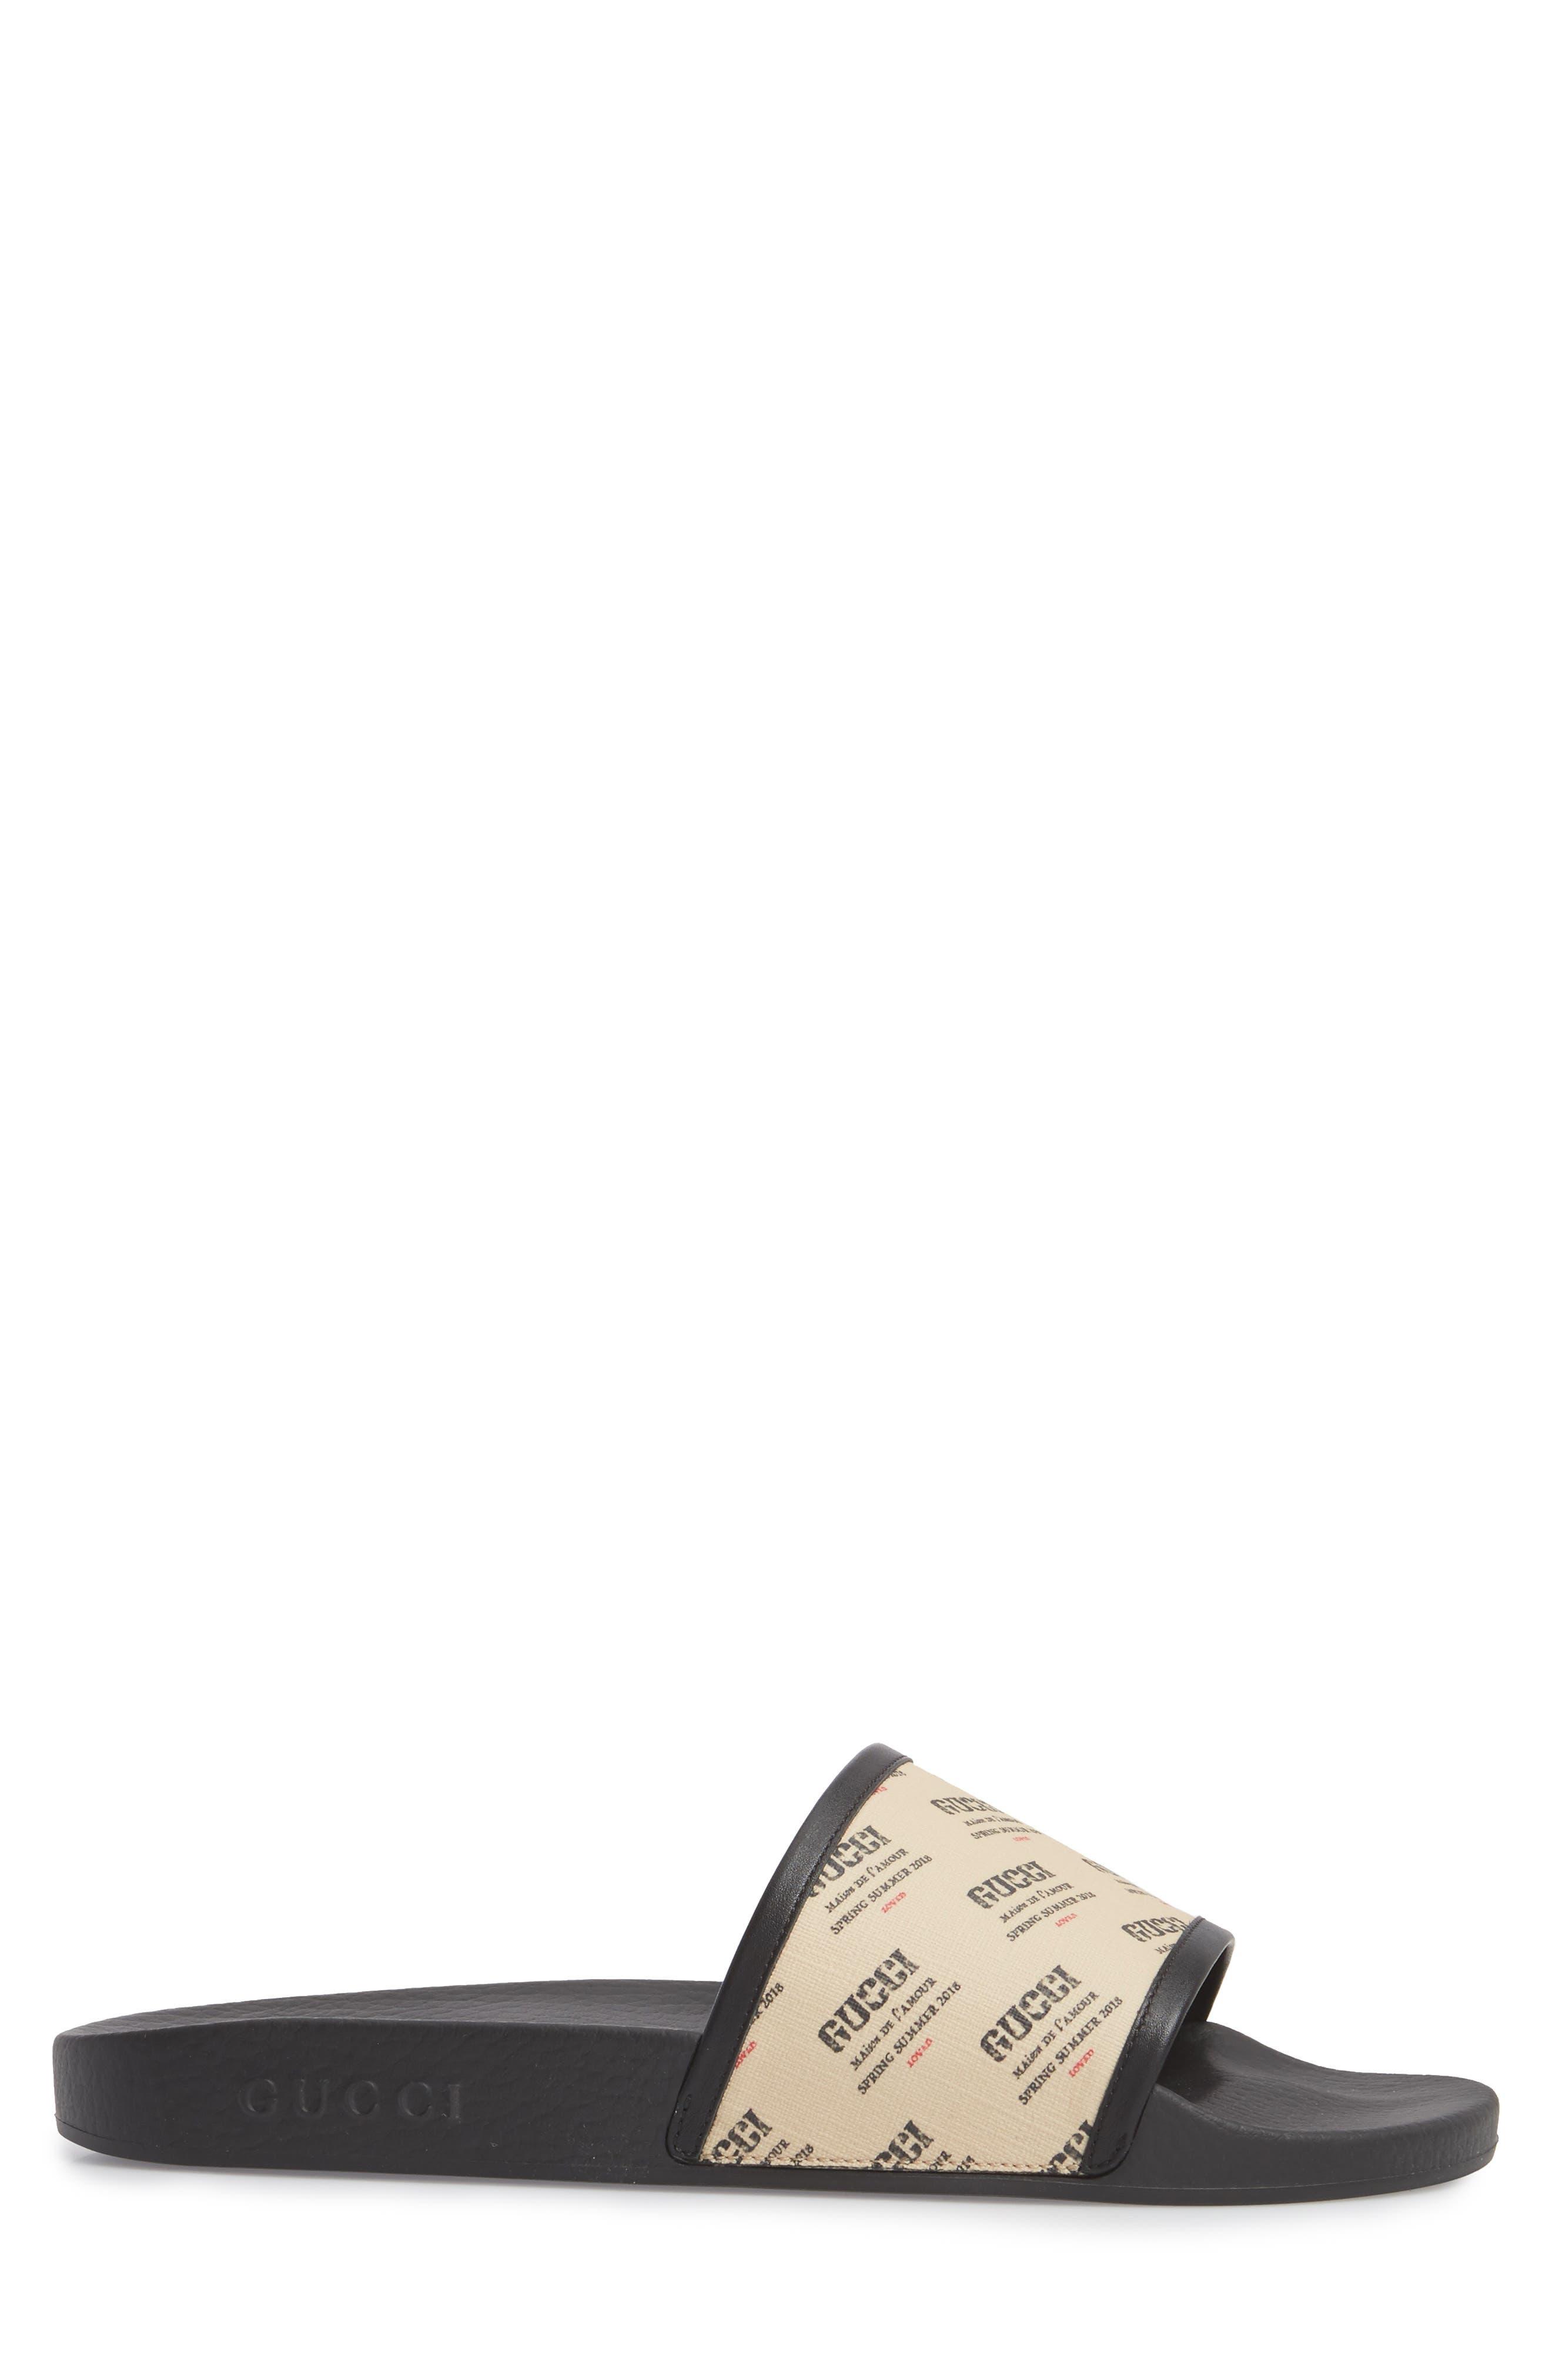 Invite Slide Sandal,                             Alternate thumbnail 3, color,                             Black Patino